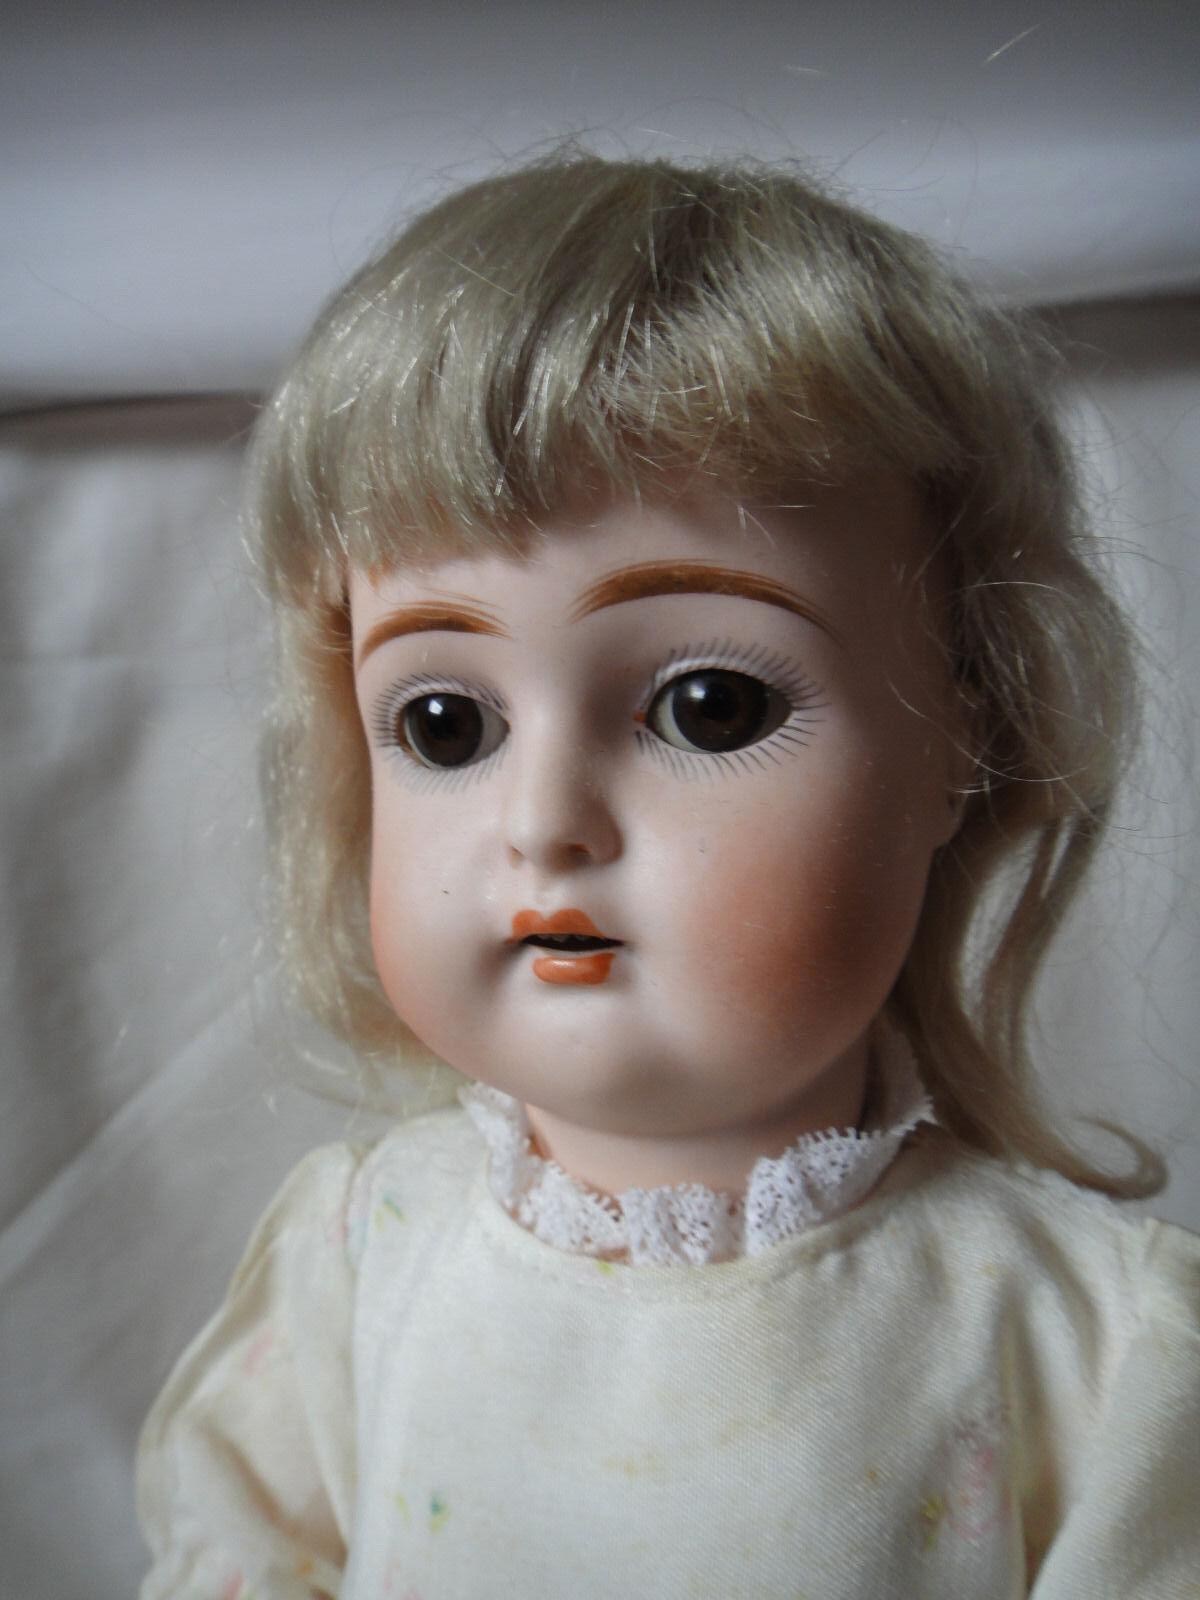 Antigua muñeca Kestner 192 14 1 2 Pulgadas alrojoedor de 1900.